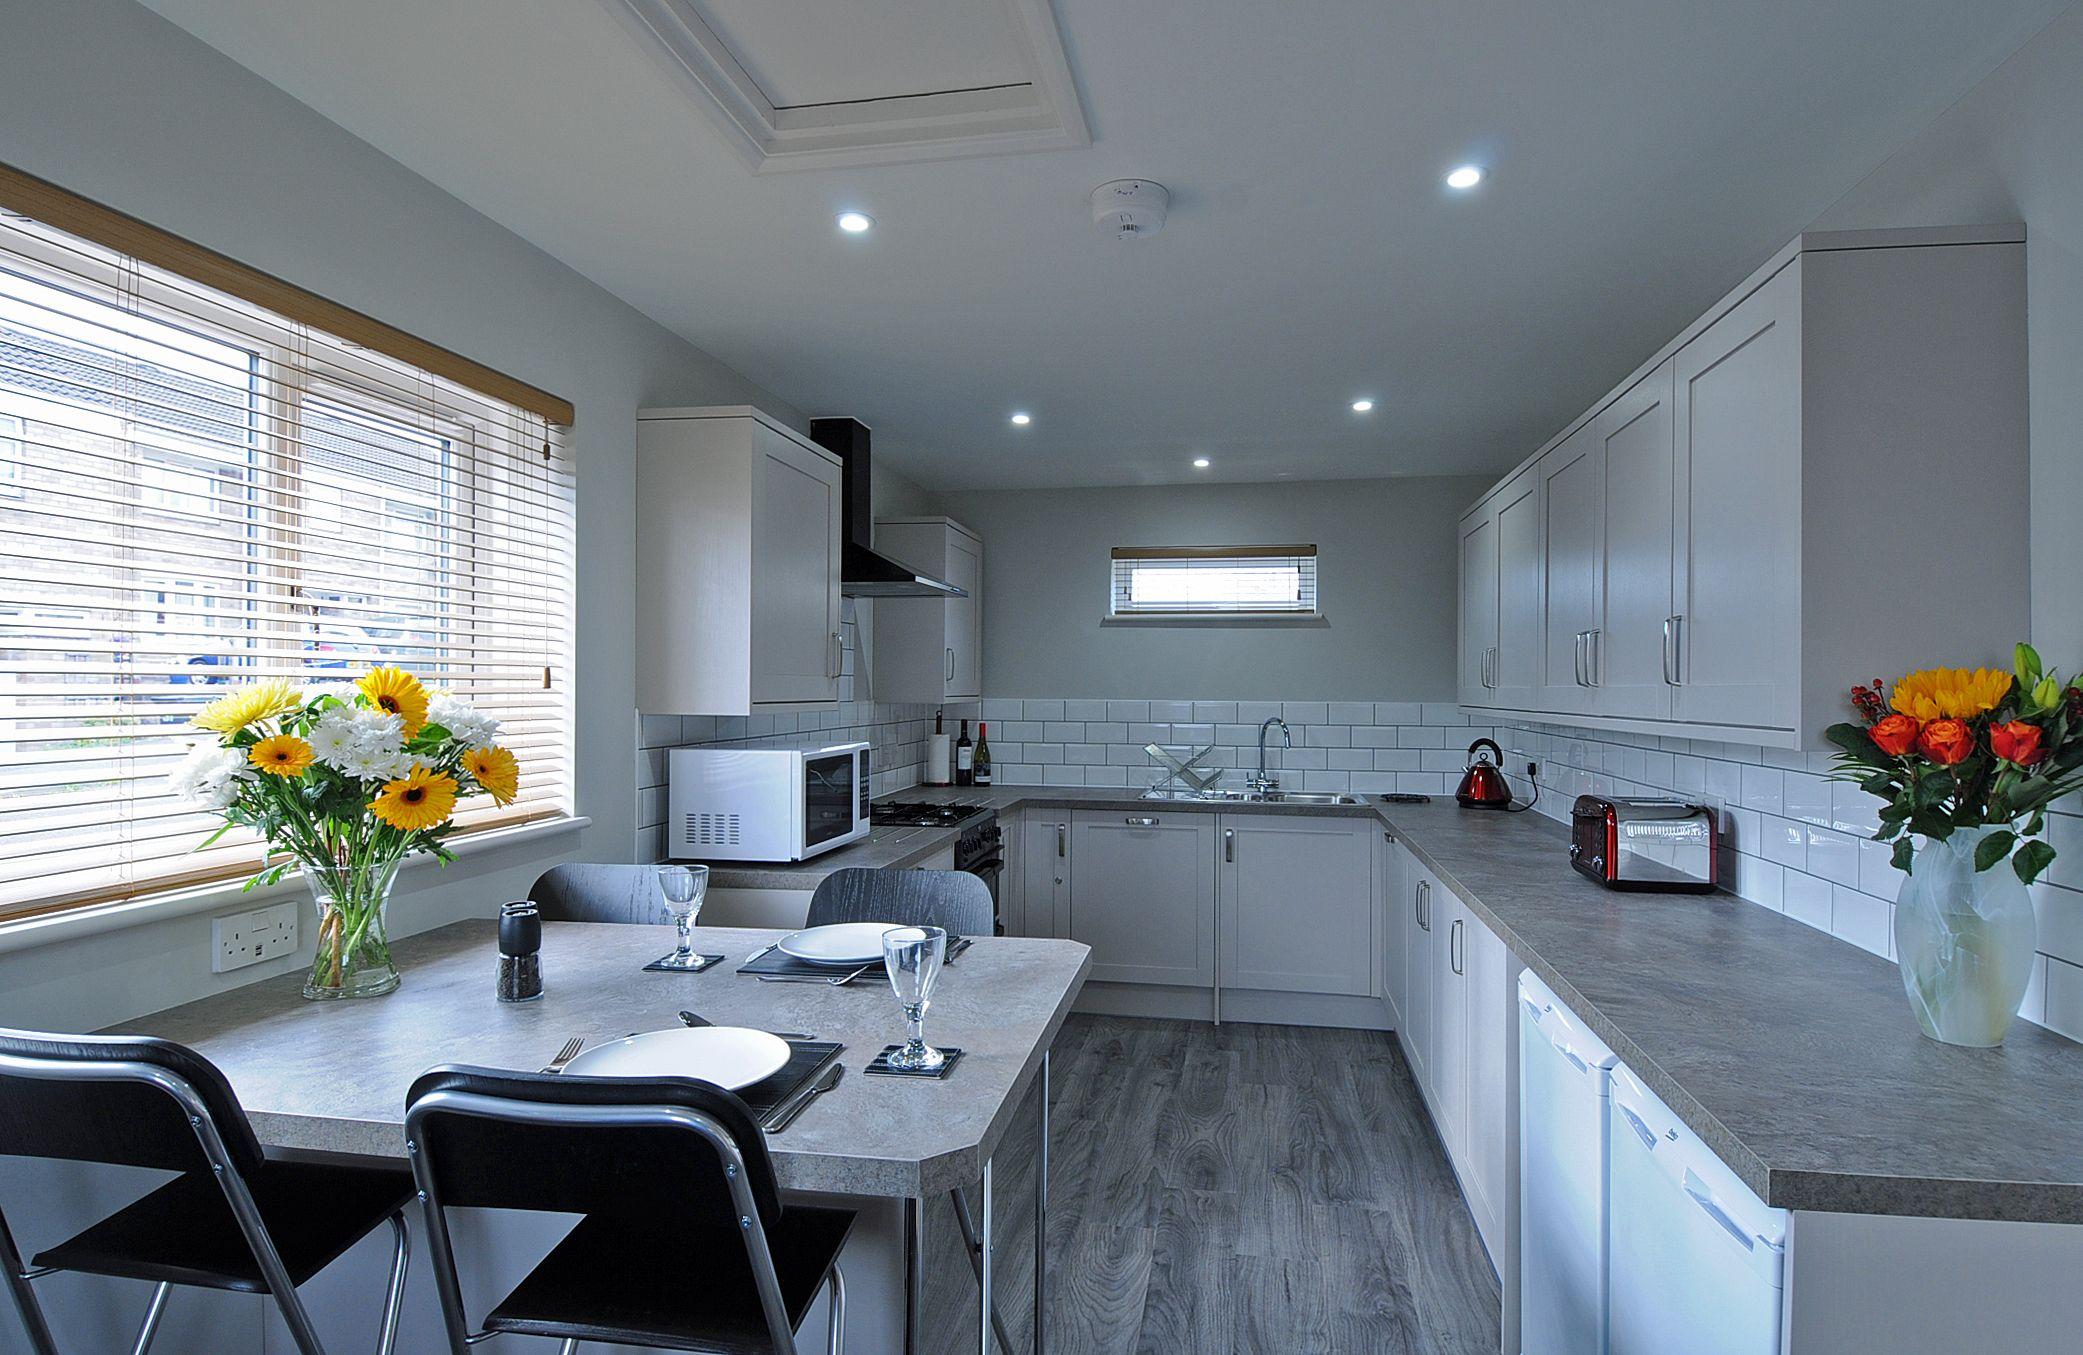 Howdens Free kitchen design, Kitchen, Kitchen design